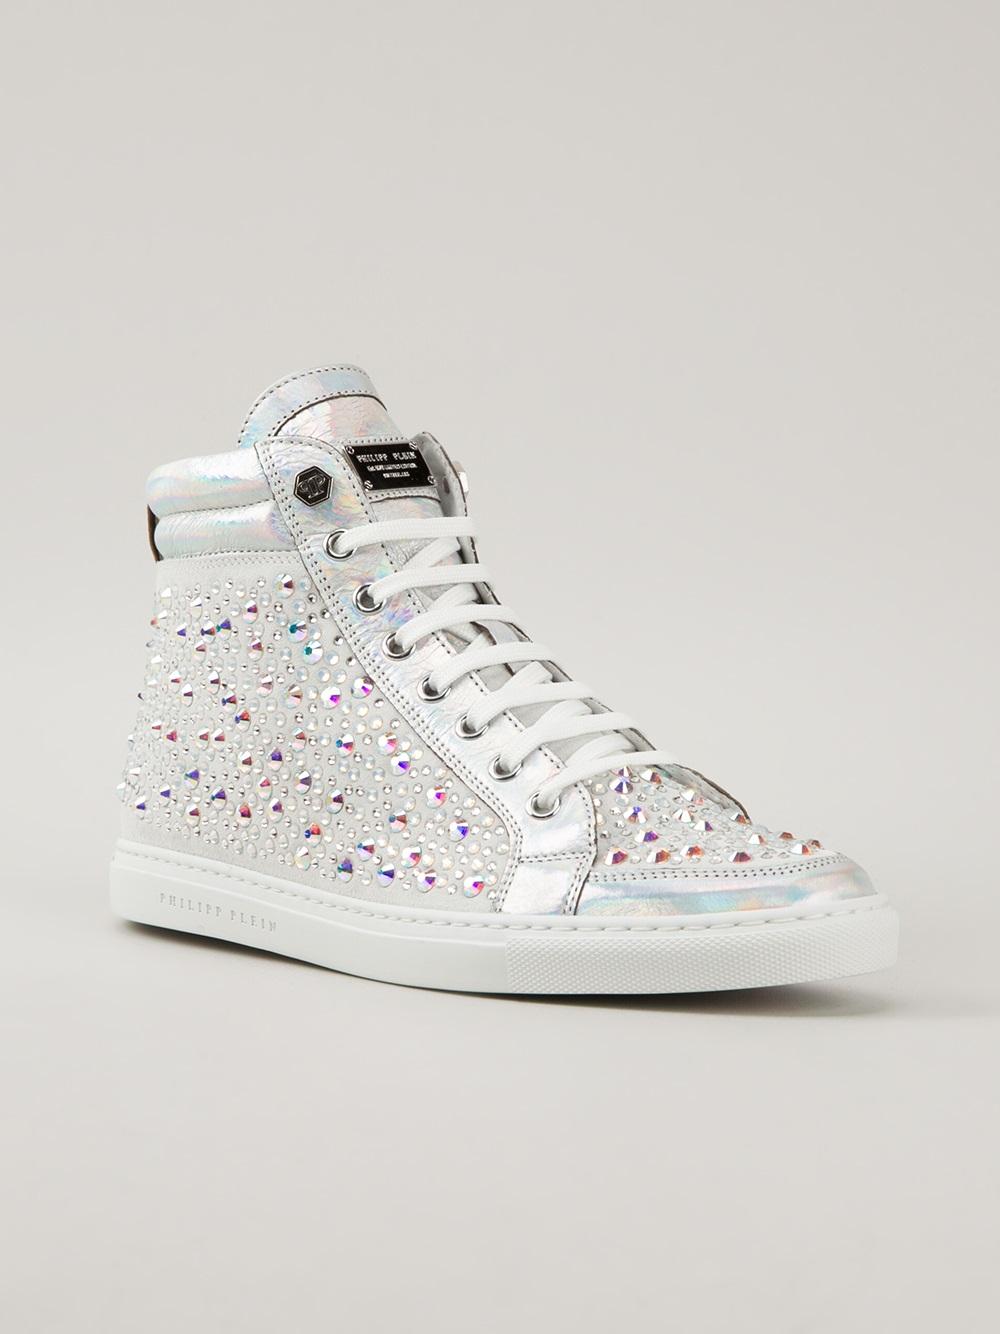 Full Of Crystal sneakers - White Philipp Plein iyzTZ8